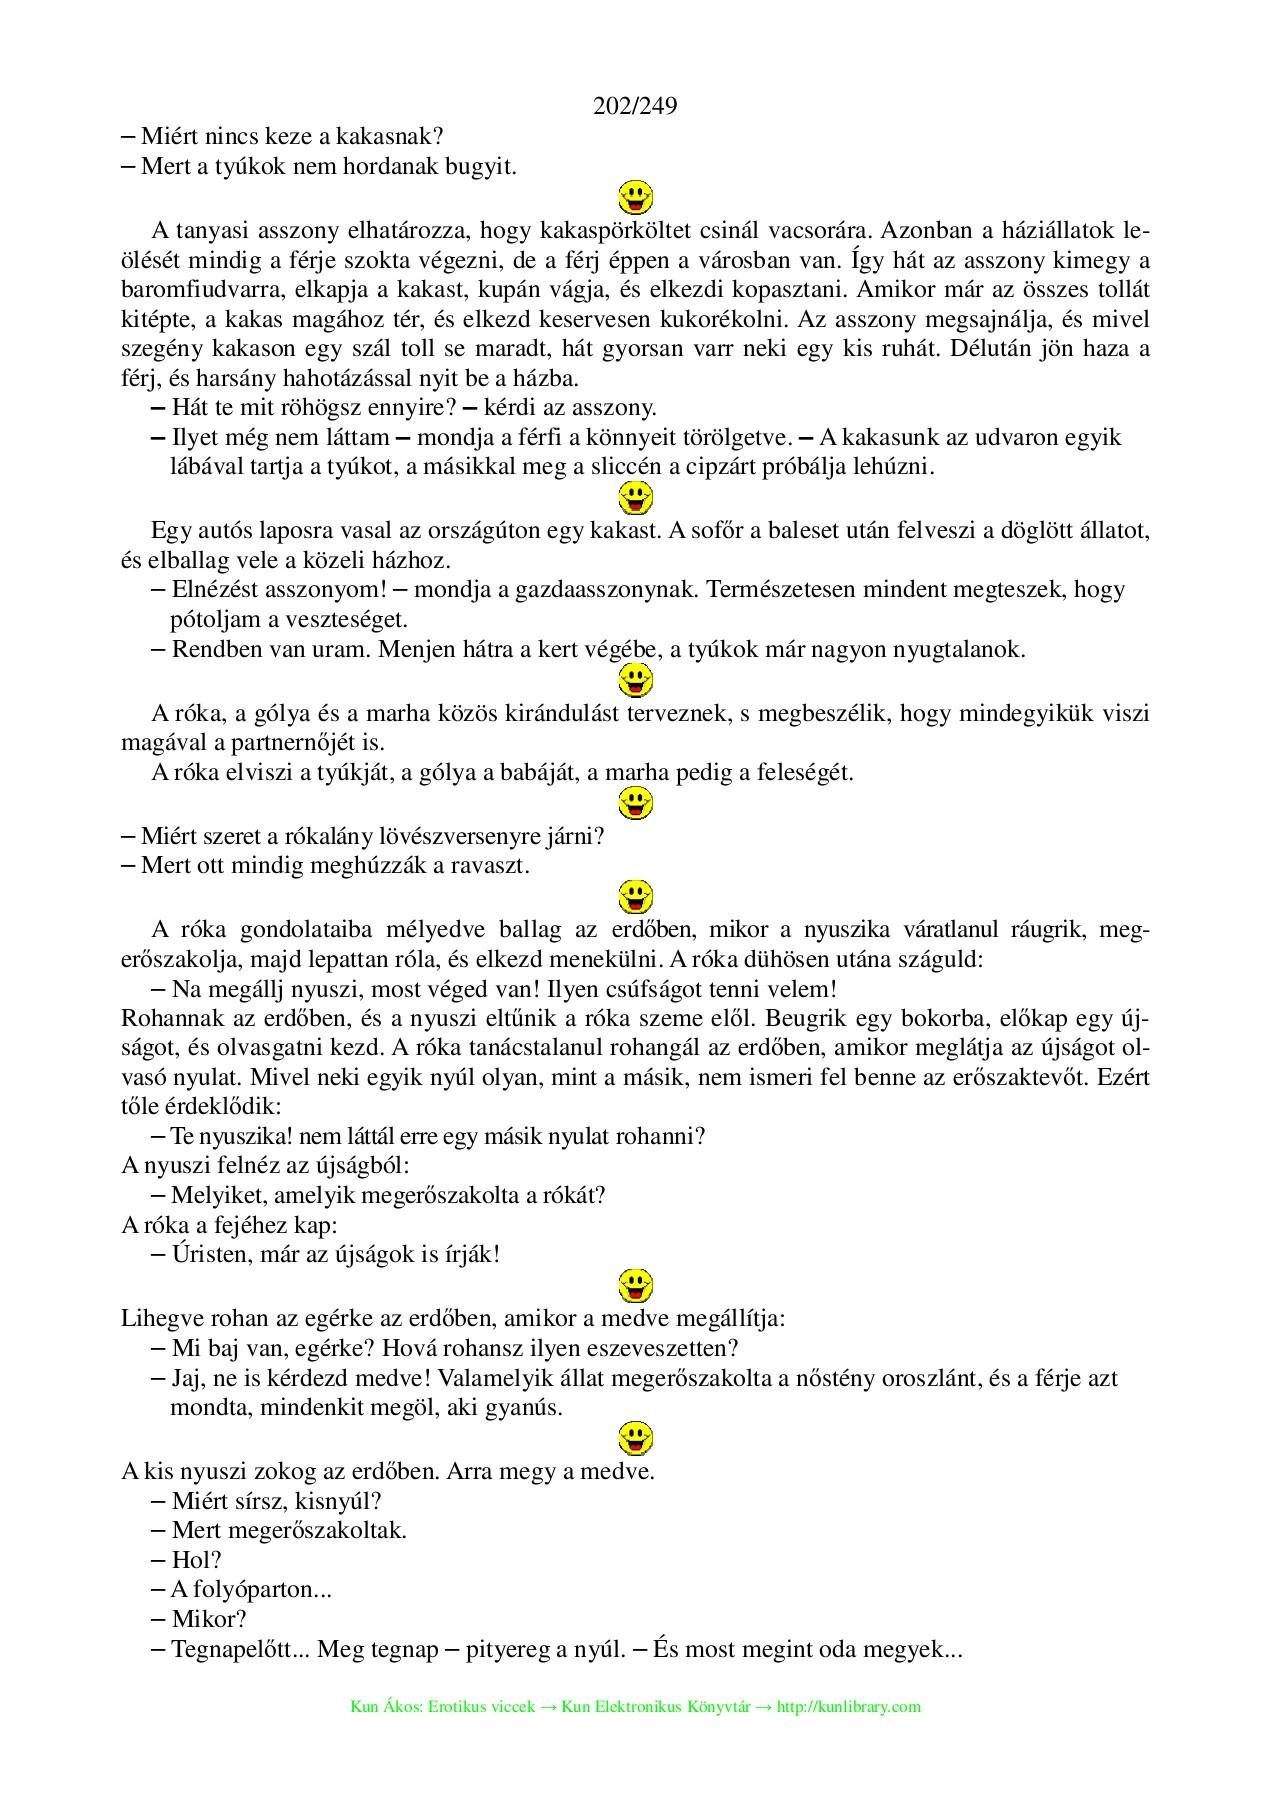 oxabaktériumok 48